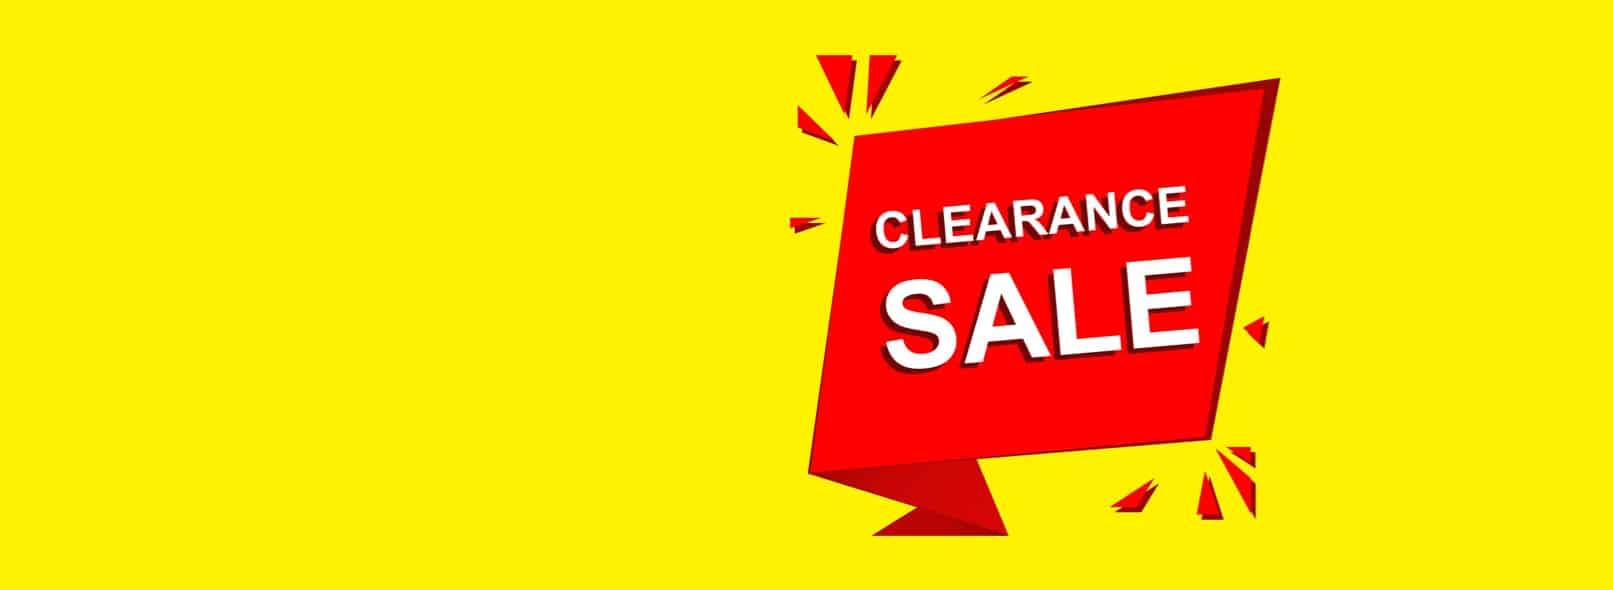 Clearance-Sale 21.35.14